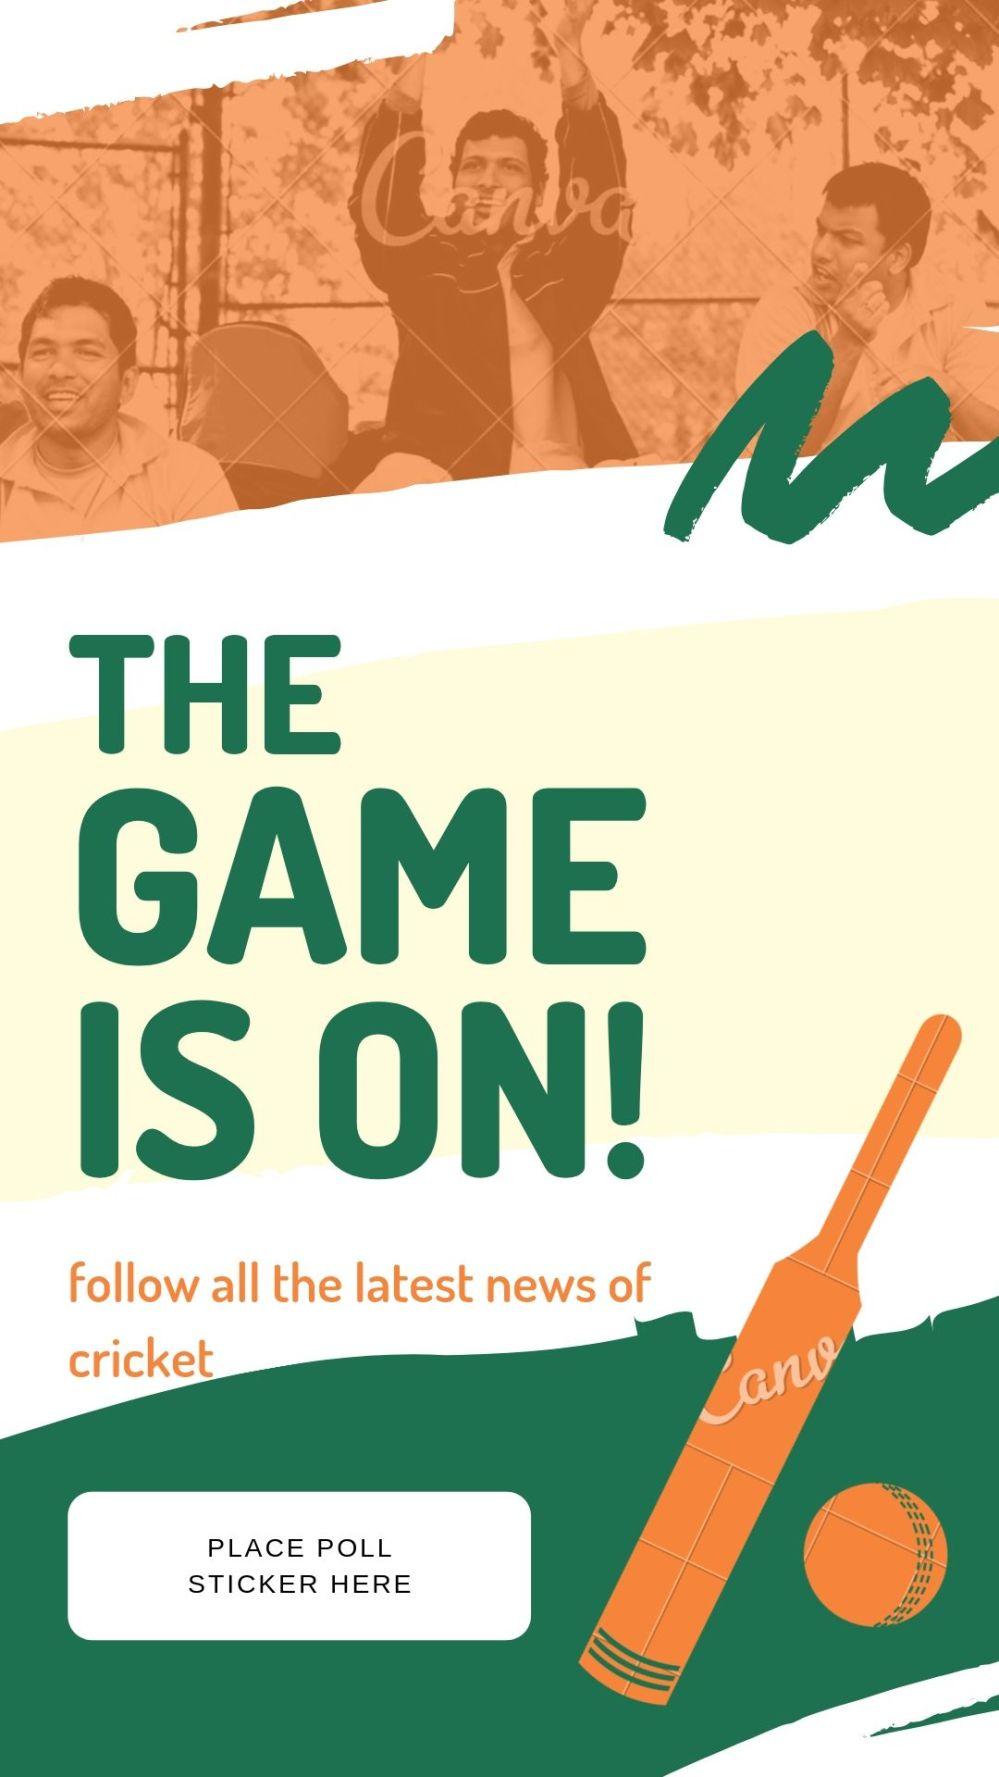 Green and Orange Team Cricket Instagram Story.jpg